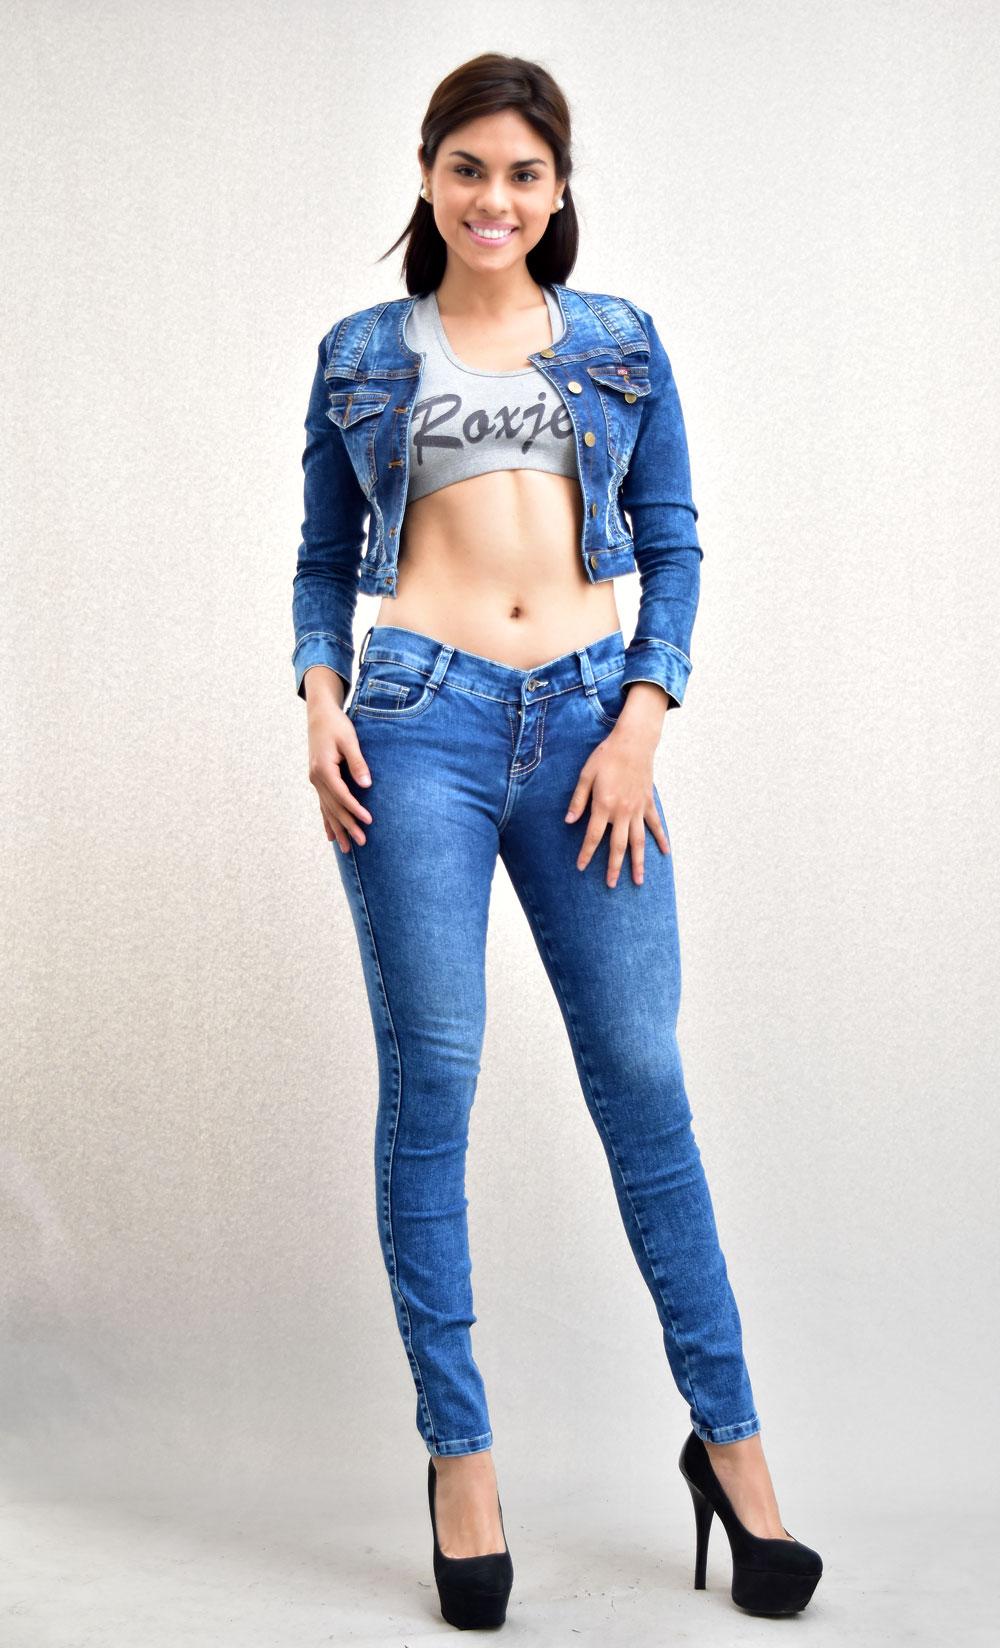 Roxje S Jeans Tiendas De Ropa En Gamarra Lima Peru